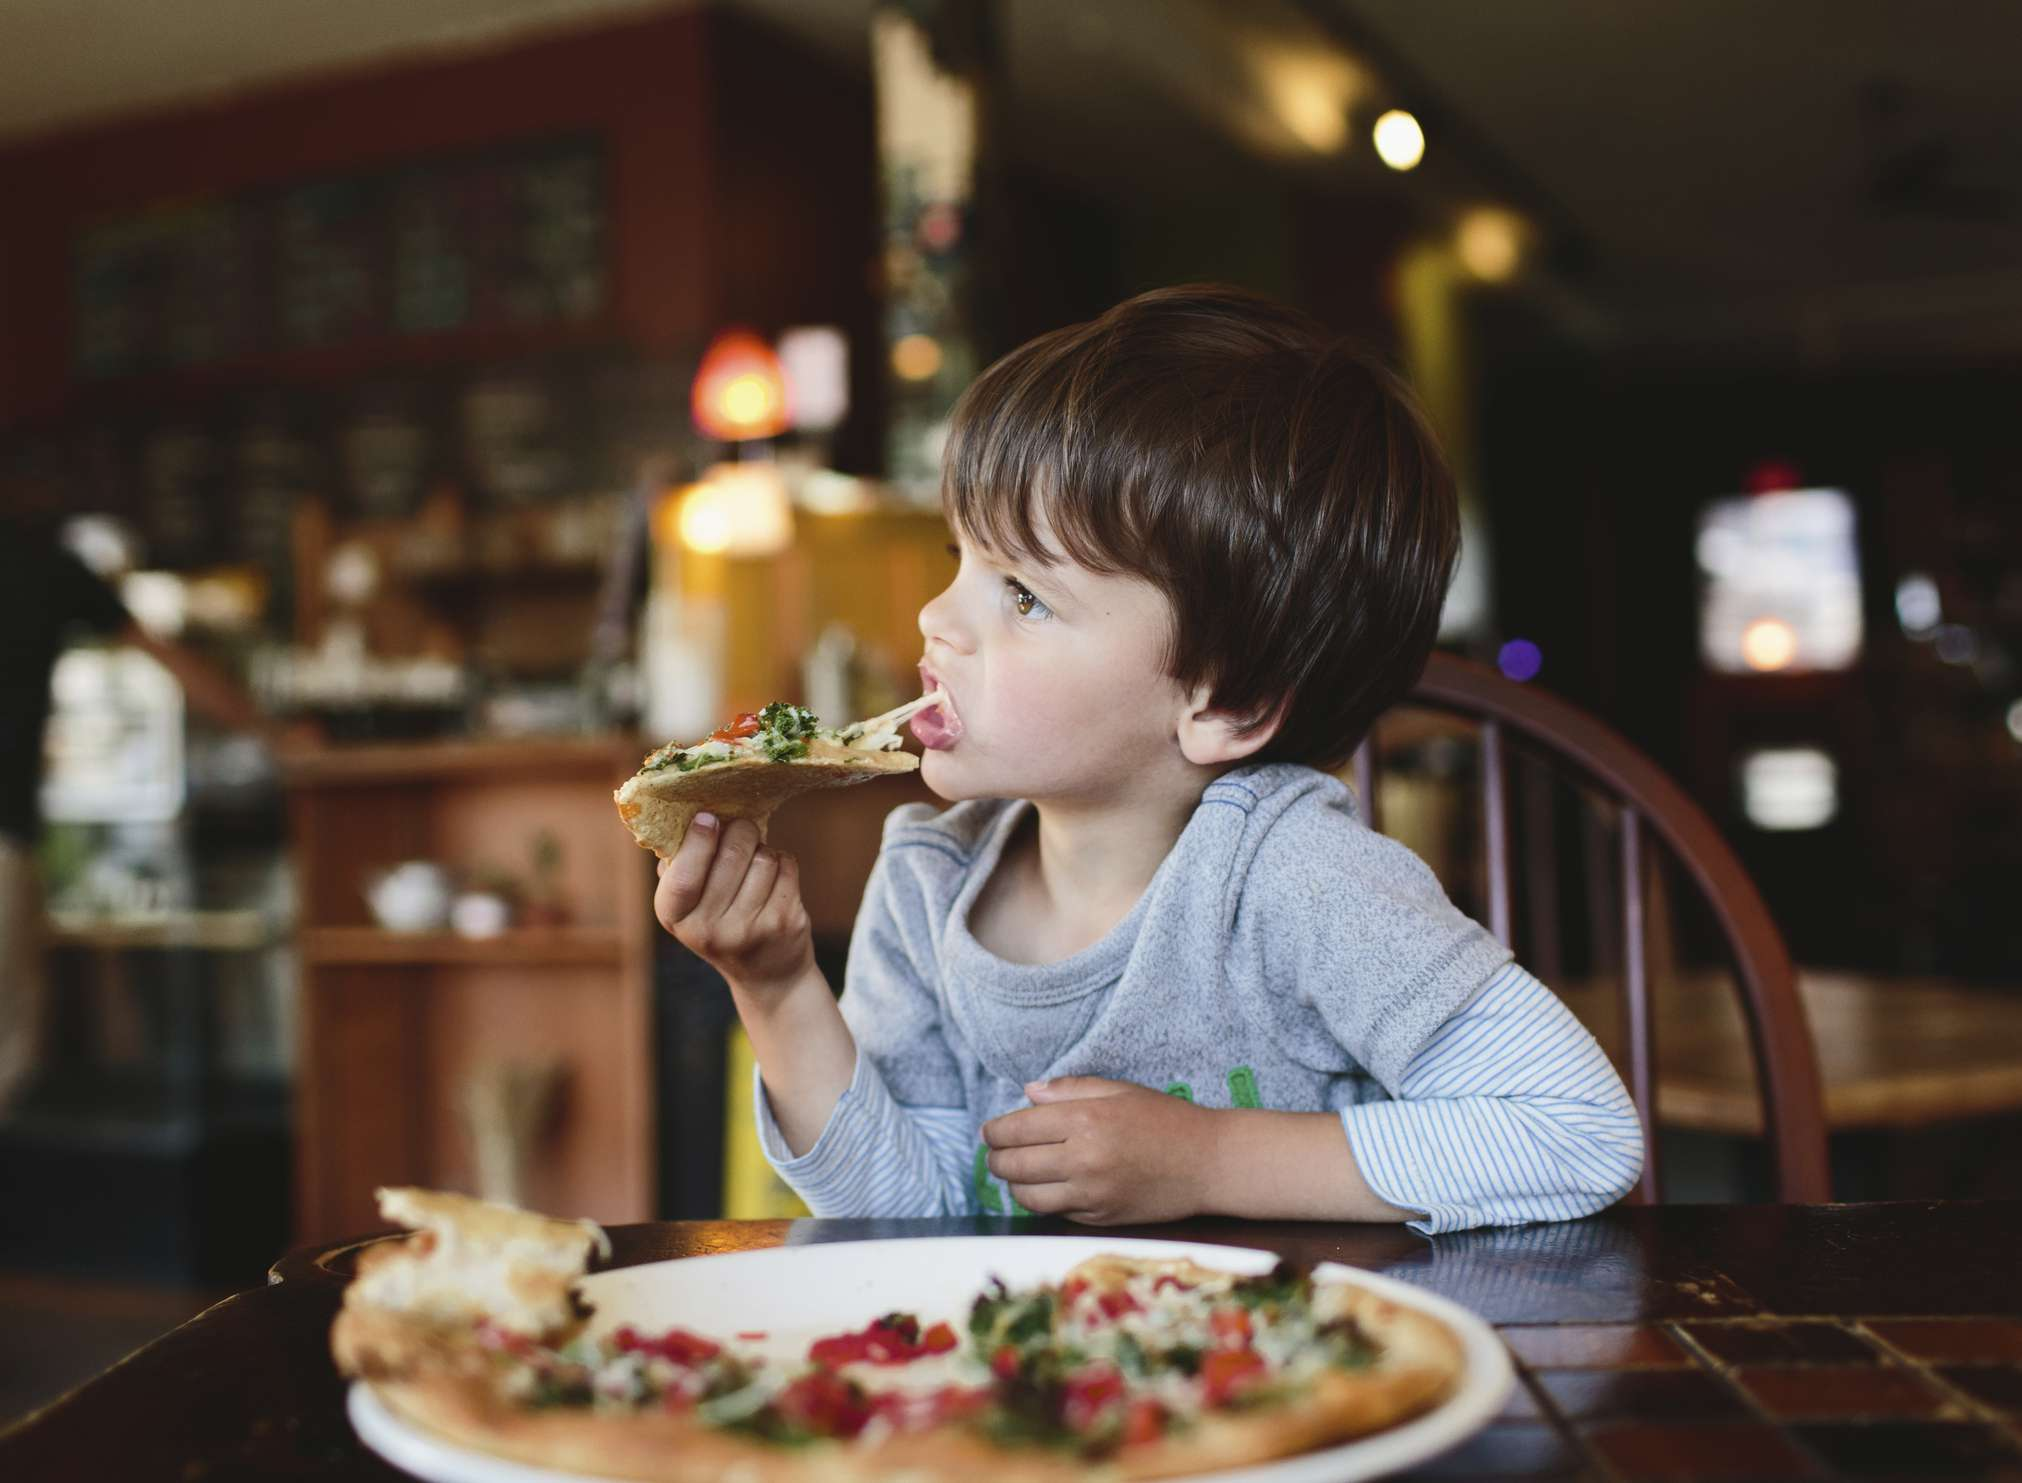 Boy Eating Pizza in Restaurant